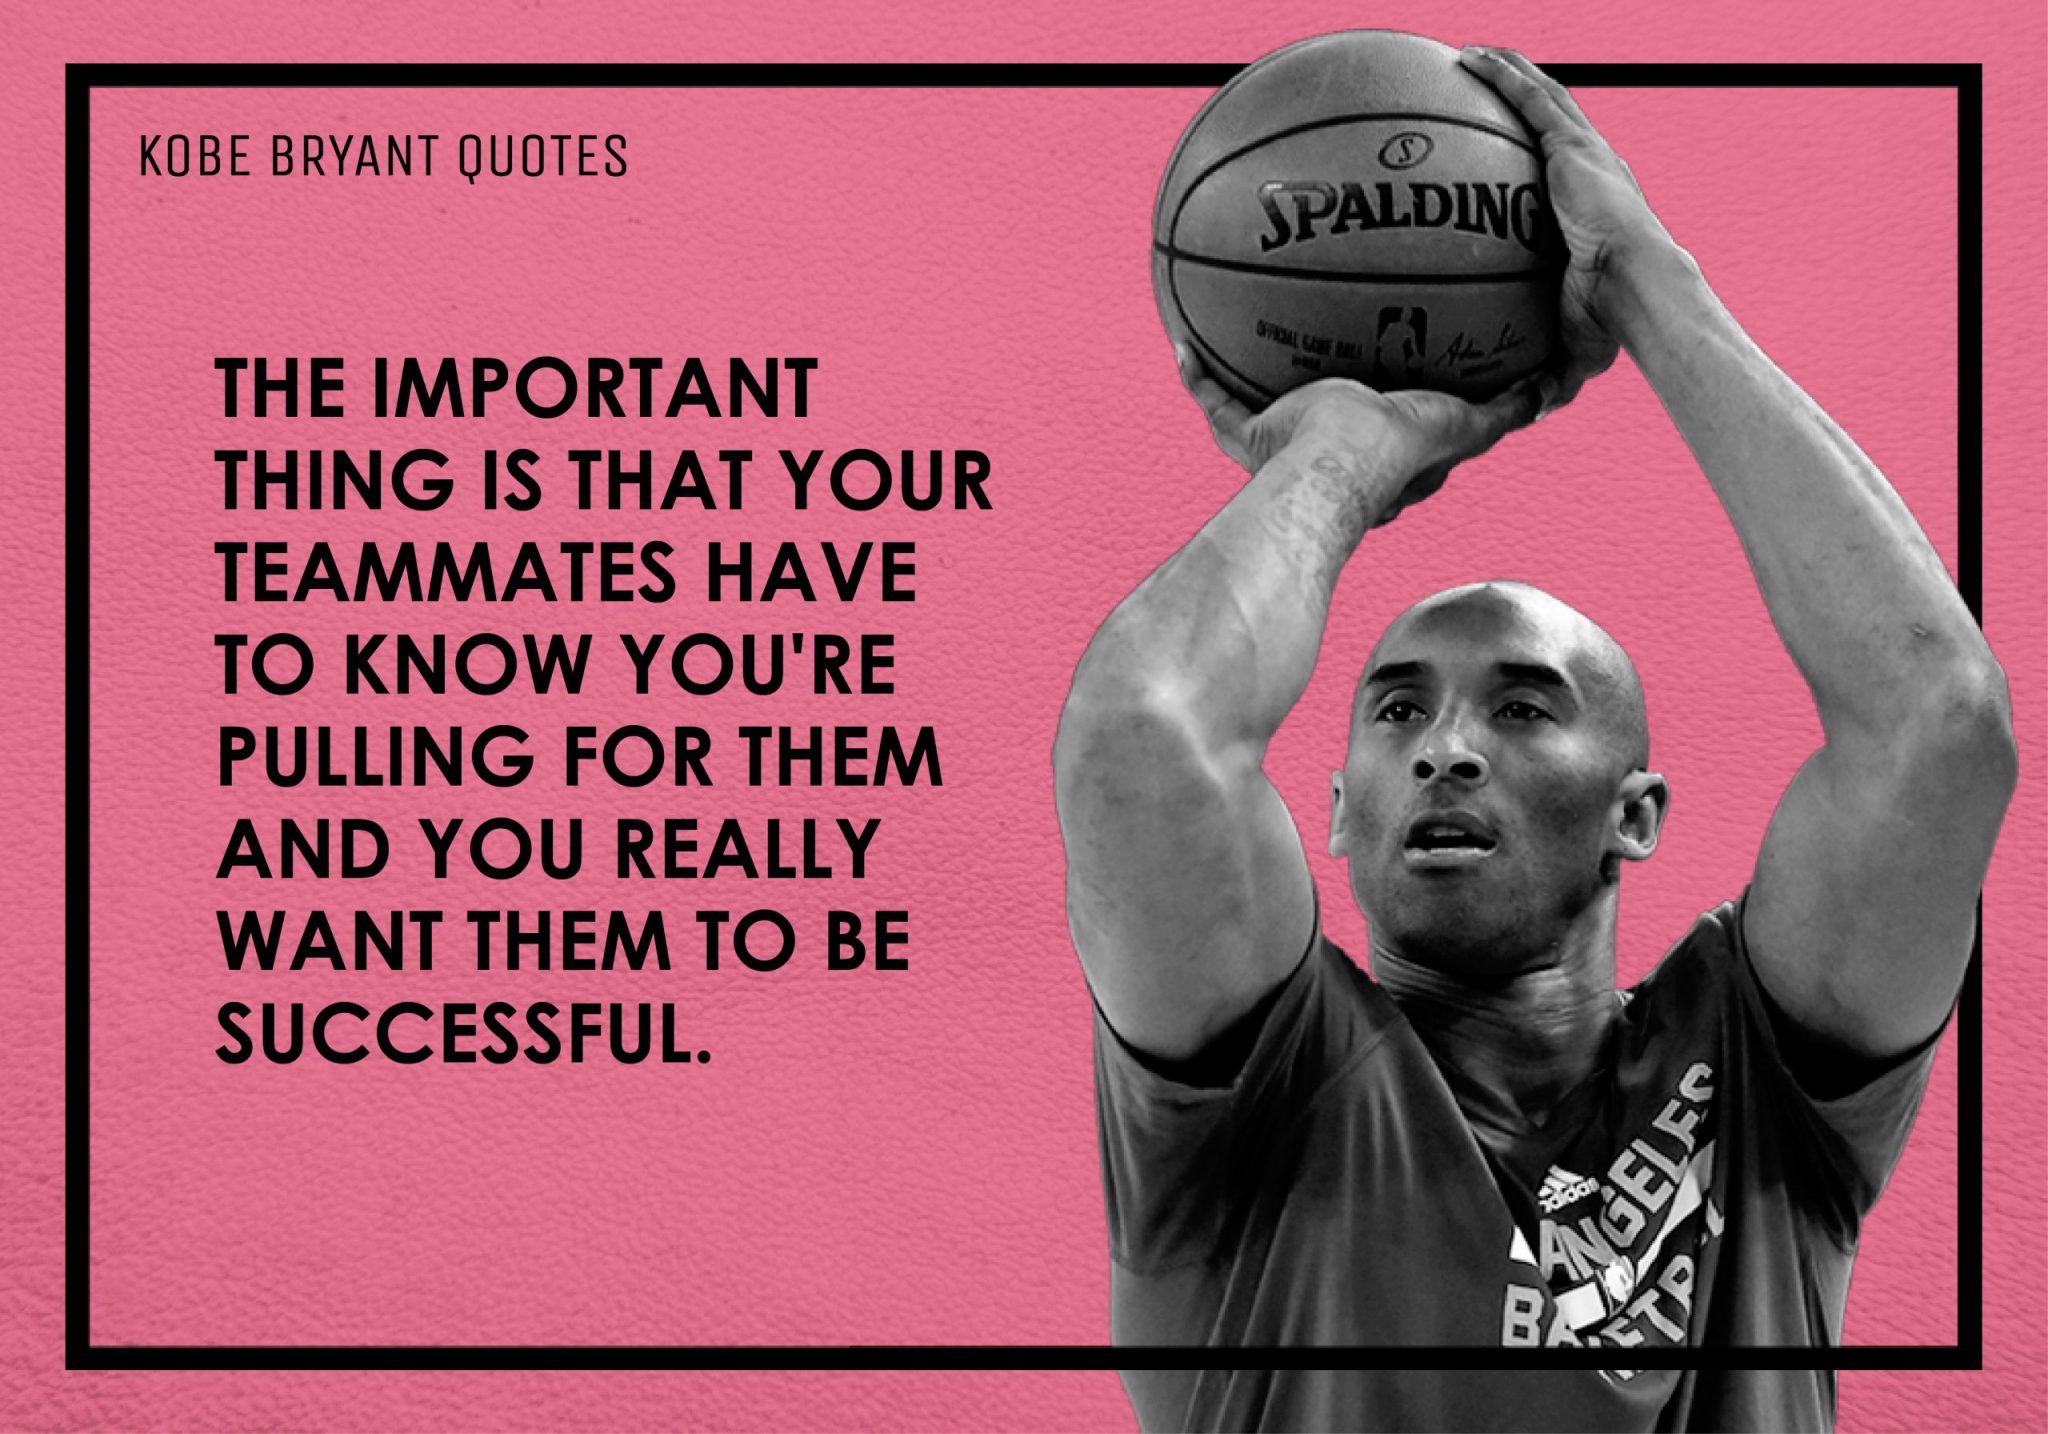 Kobe Bryant Quotes (2)